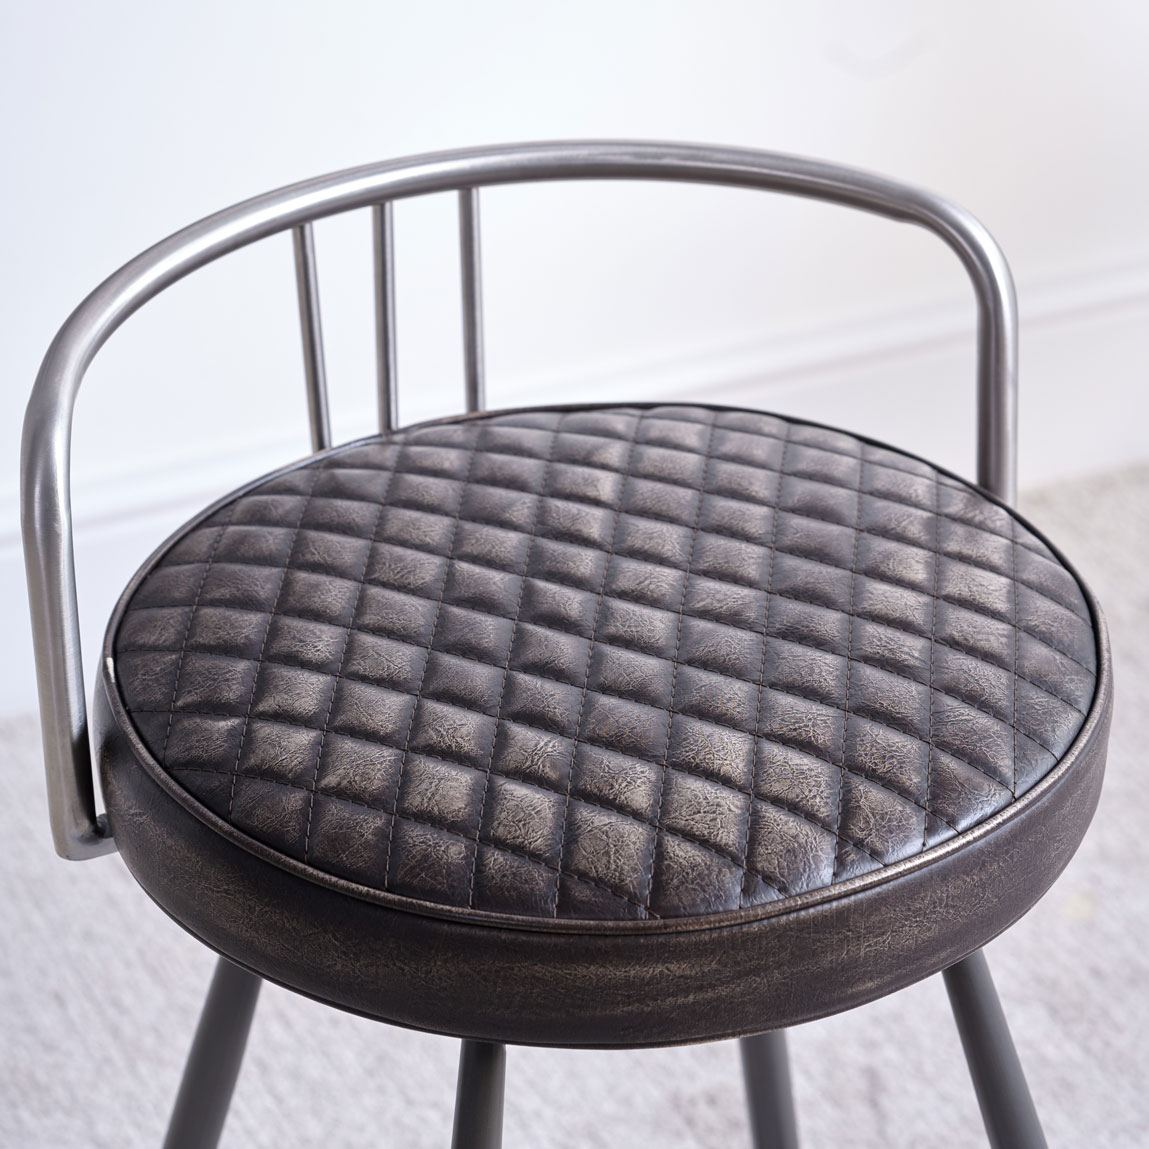 CIARA STOOL SEAT